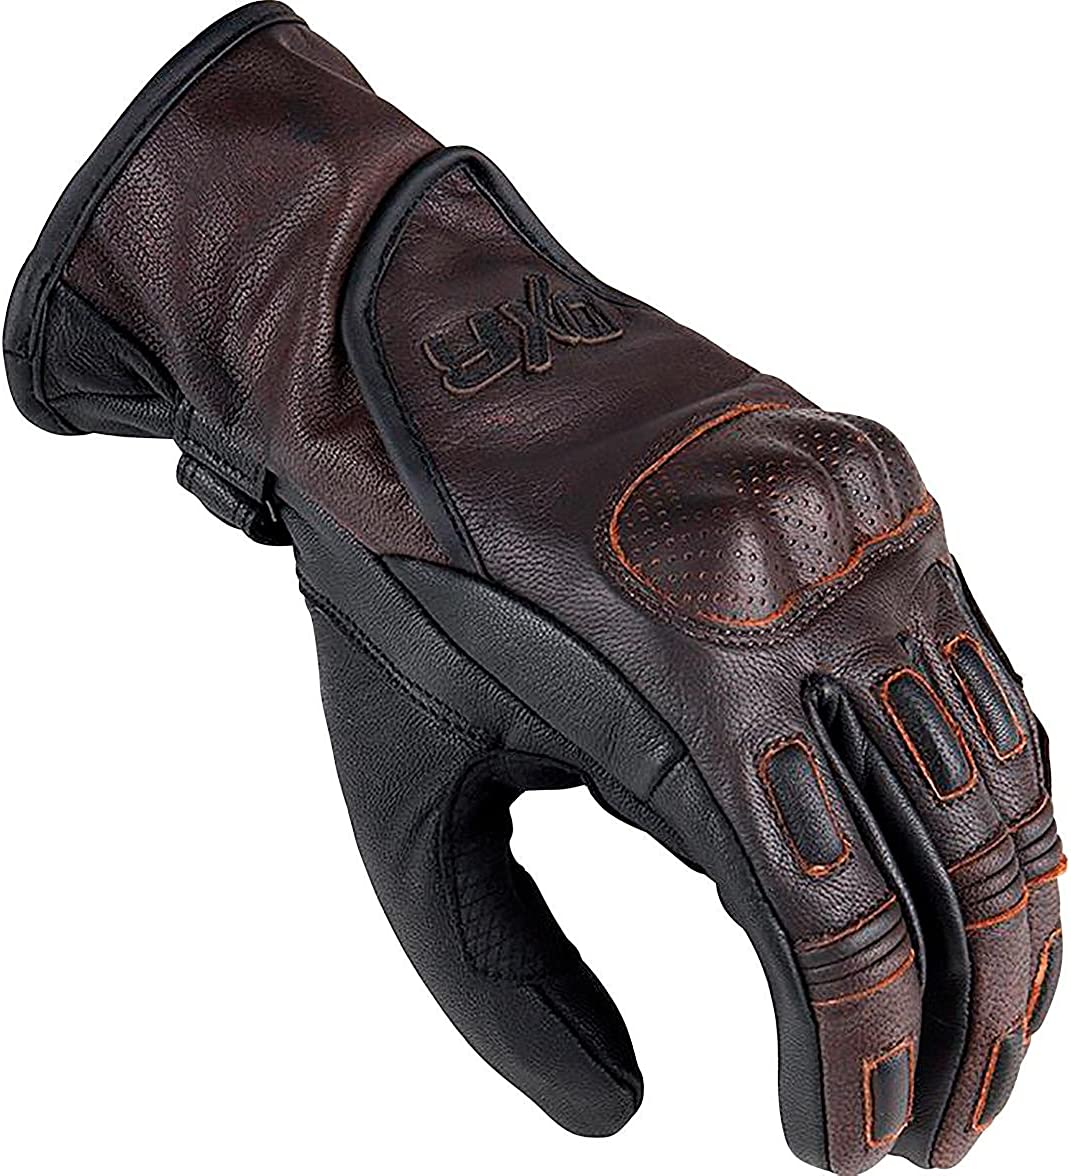 Dxr Motorradhandschuhe Kurz Motorrad Handschuh Ttr Marron Handschuh Motorradhandschuhe Herren Verstärkungen Mittelhand Finger Handfläche Handkante Ziegenleder Braun S Xxxl 3xl Bekleidung